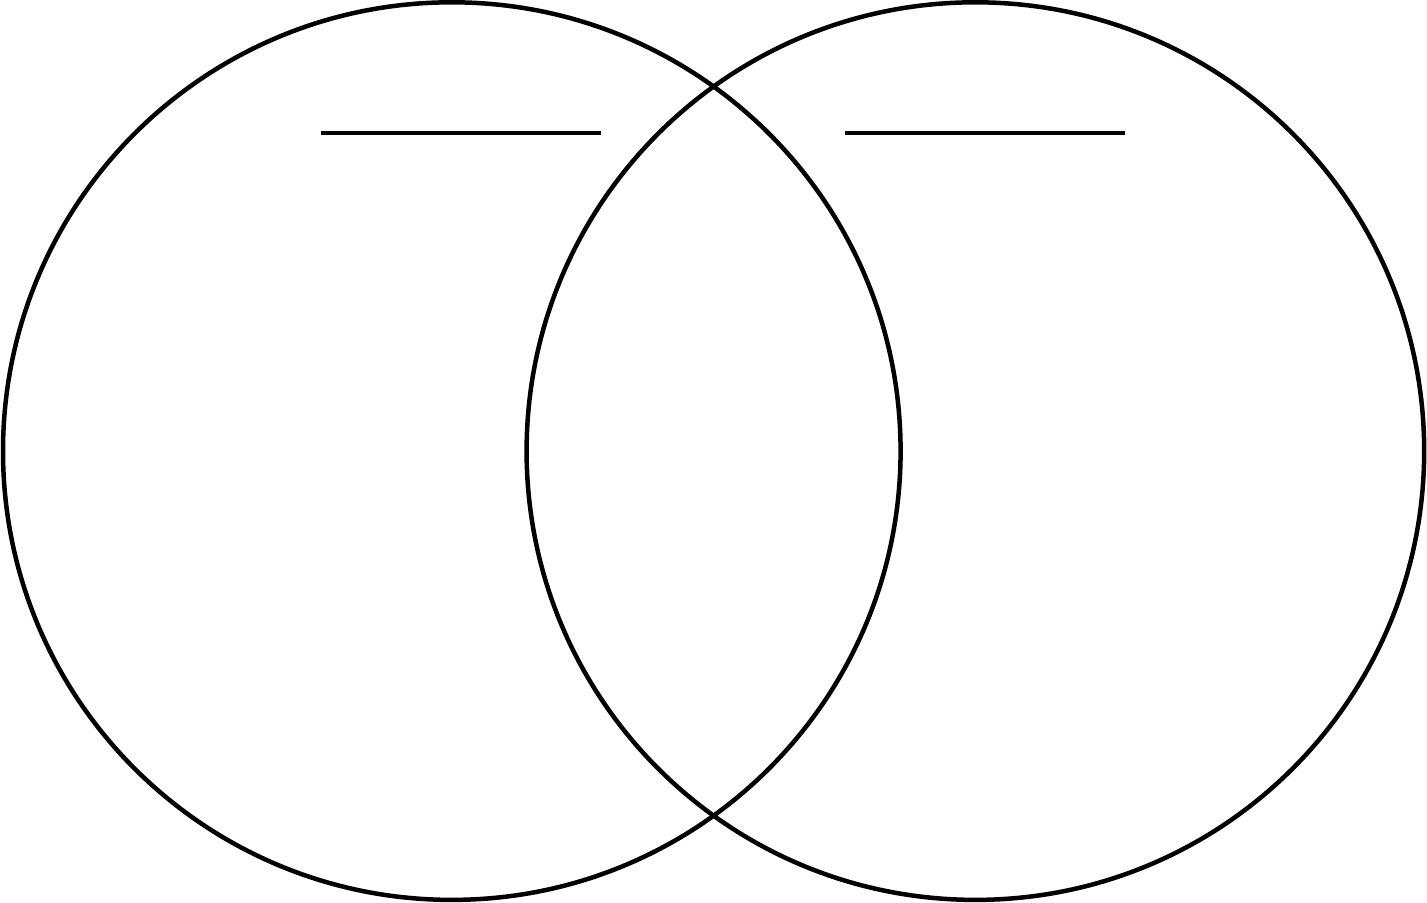 Create A Venn Diagram That Compares The Characteristics Of